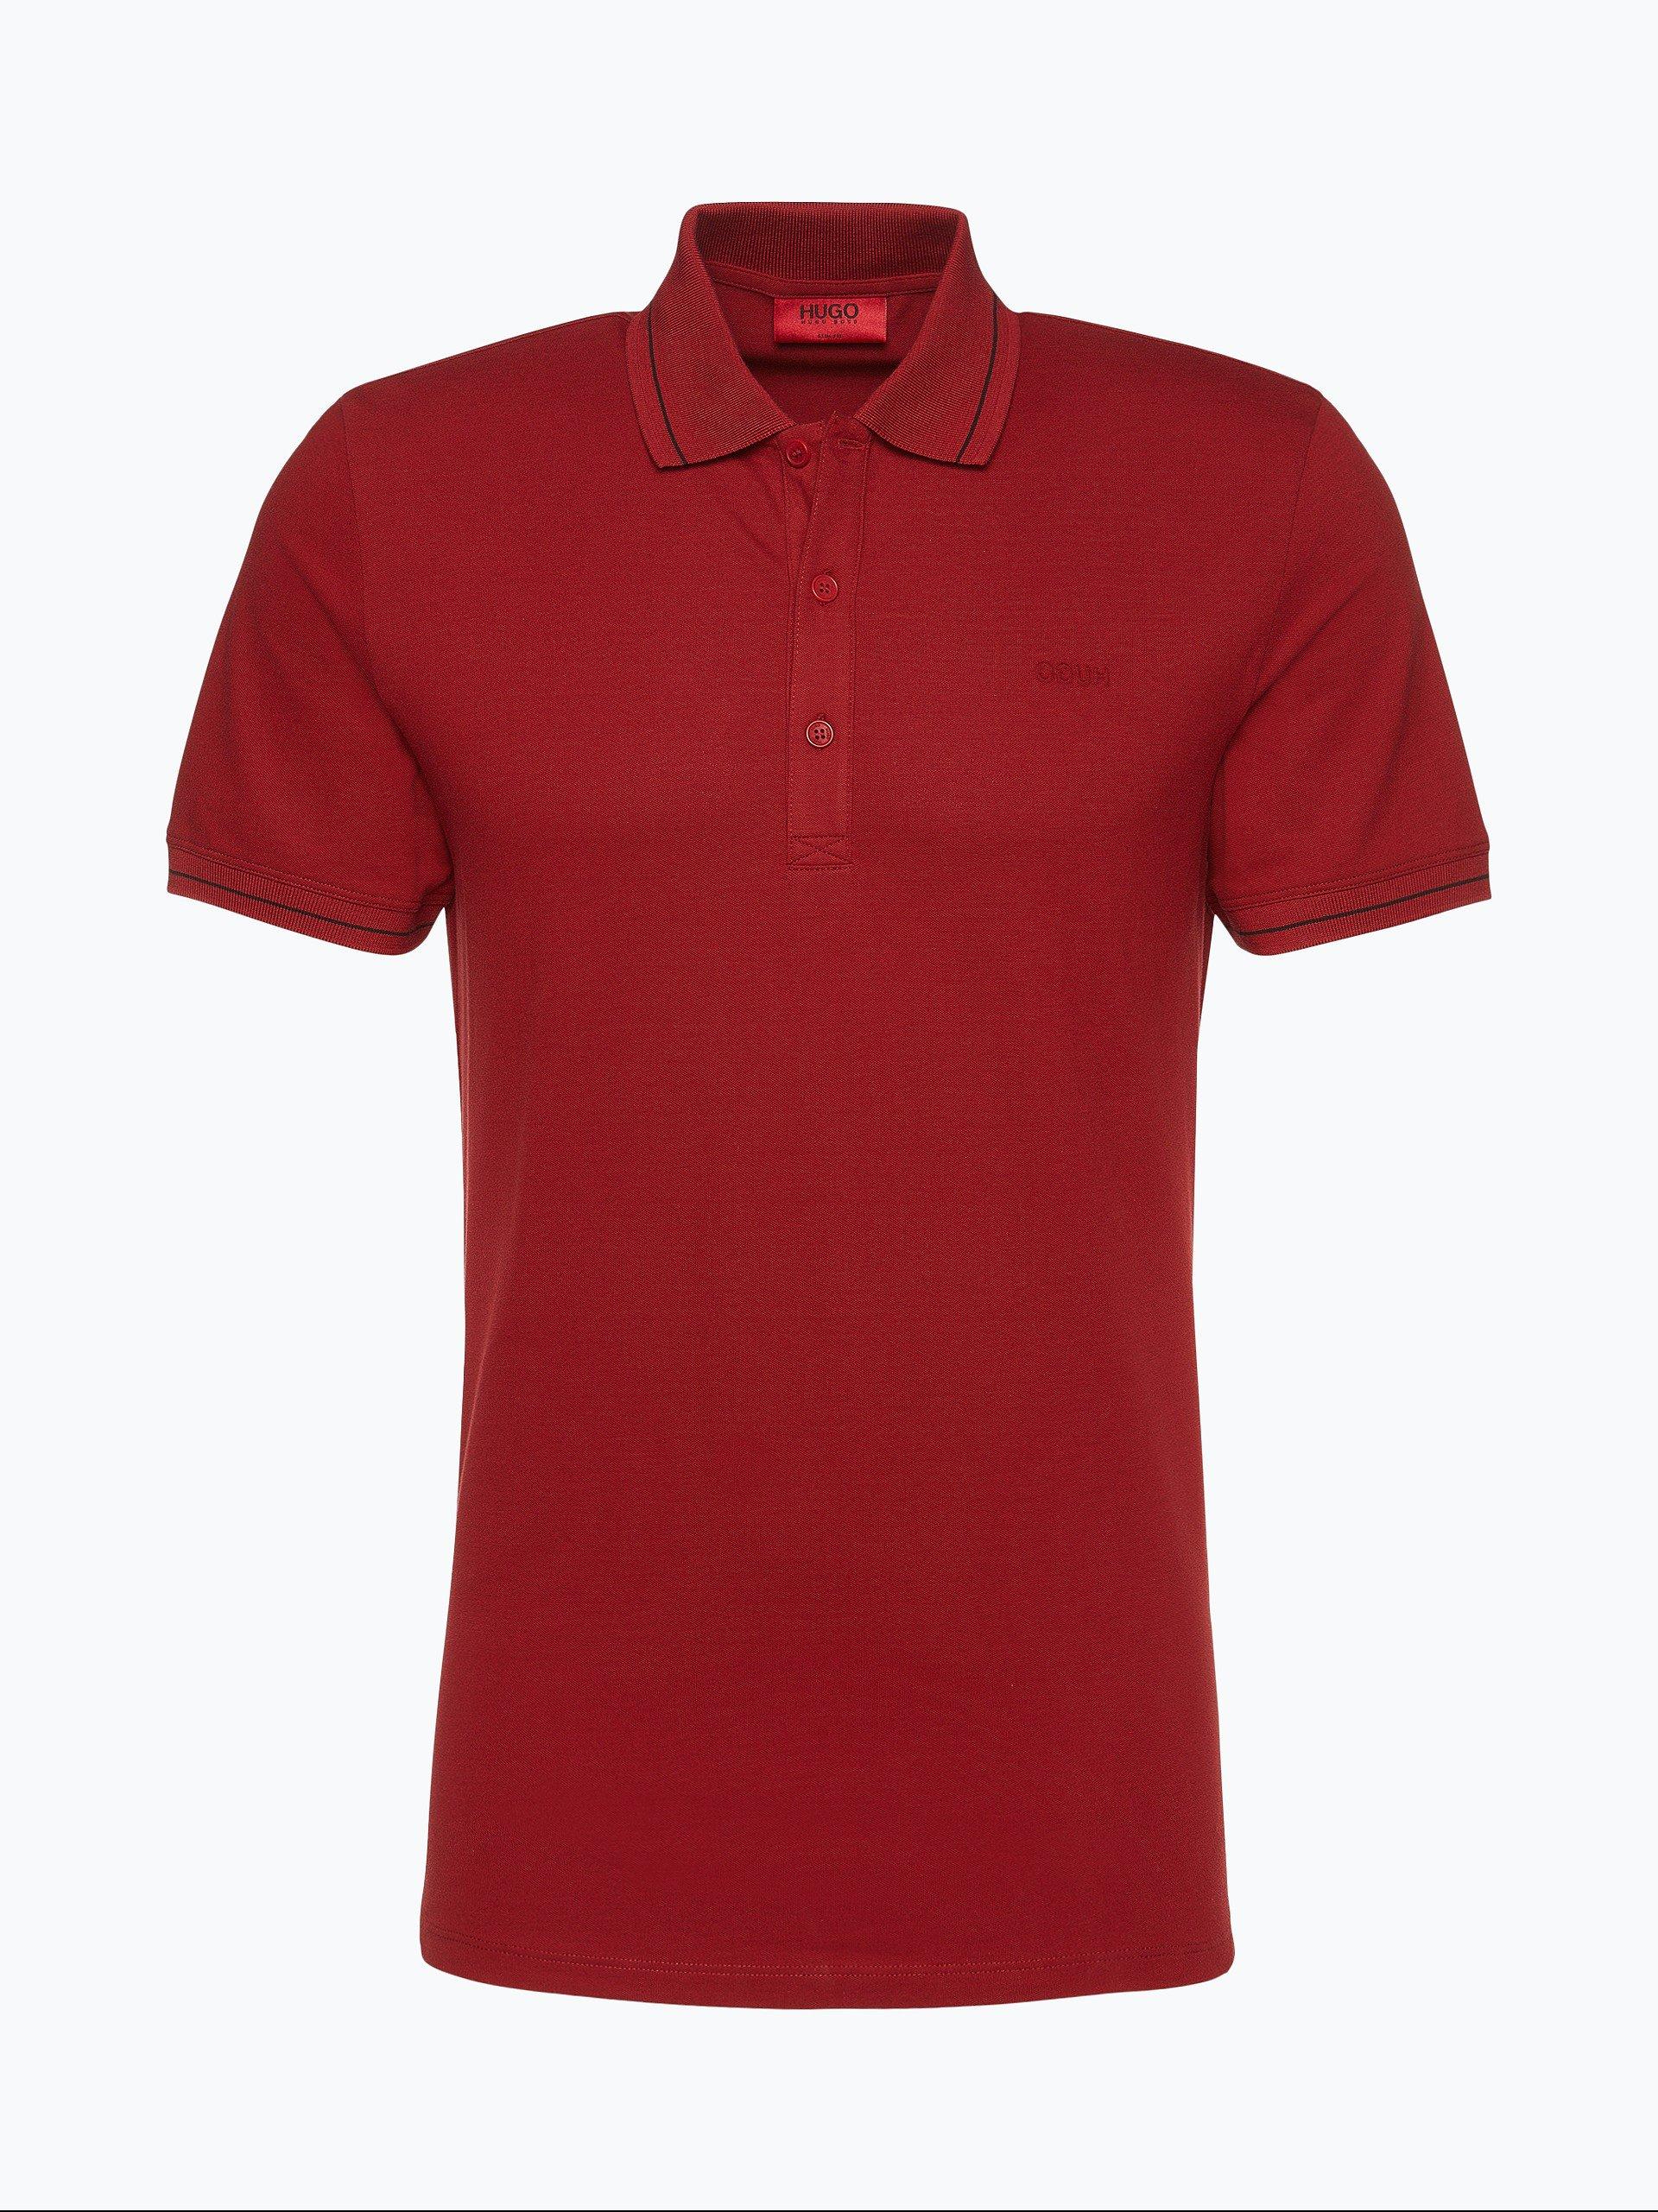 HUGO Herren Poloshirt - Daymont